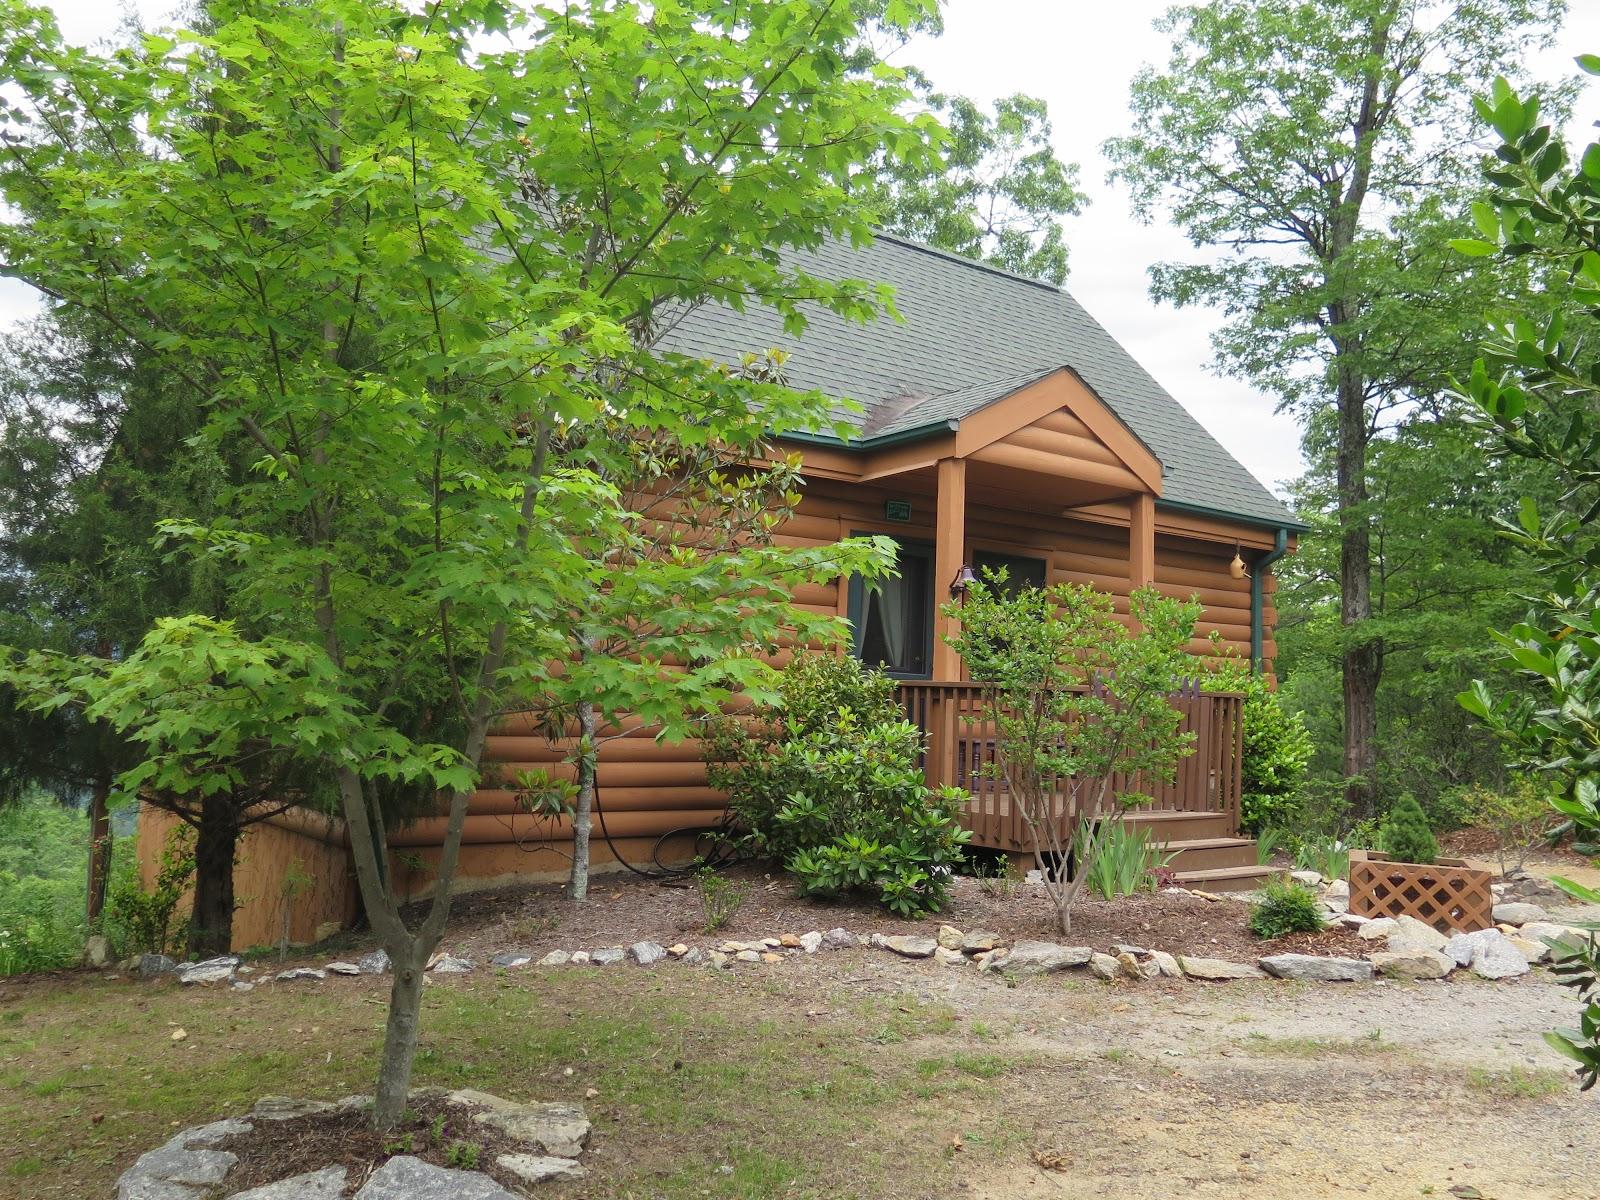 Vrbo cabins in pigeon forge tn eagles rest 4 bedroom for Log cabins rentals